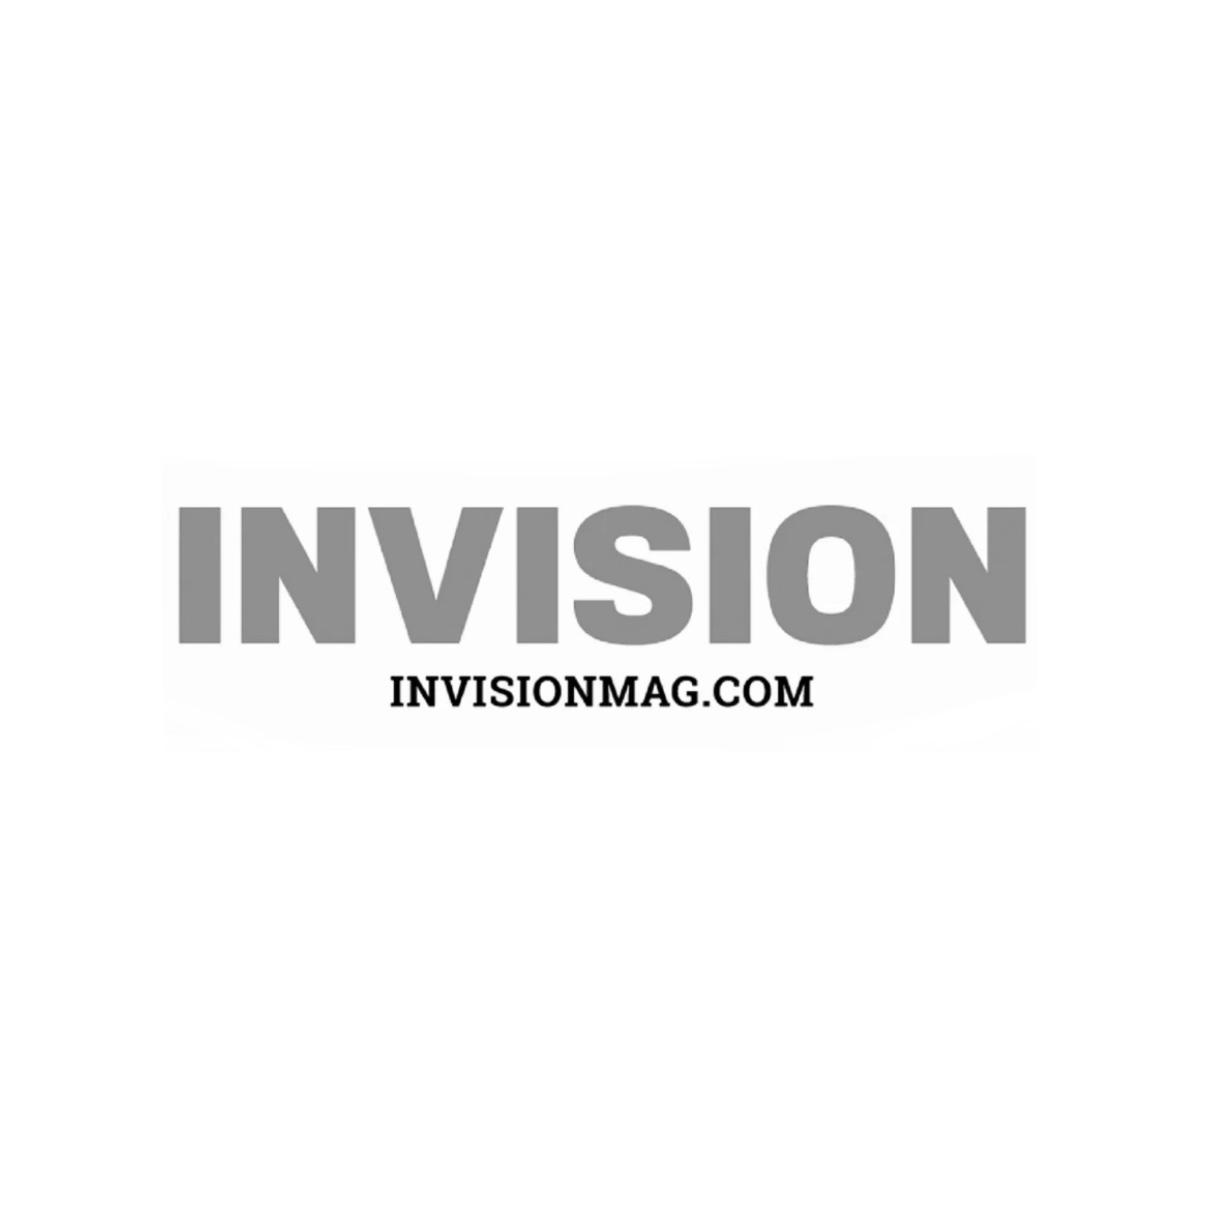 invision magazine logo